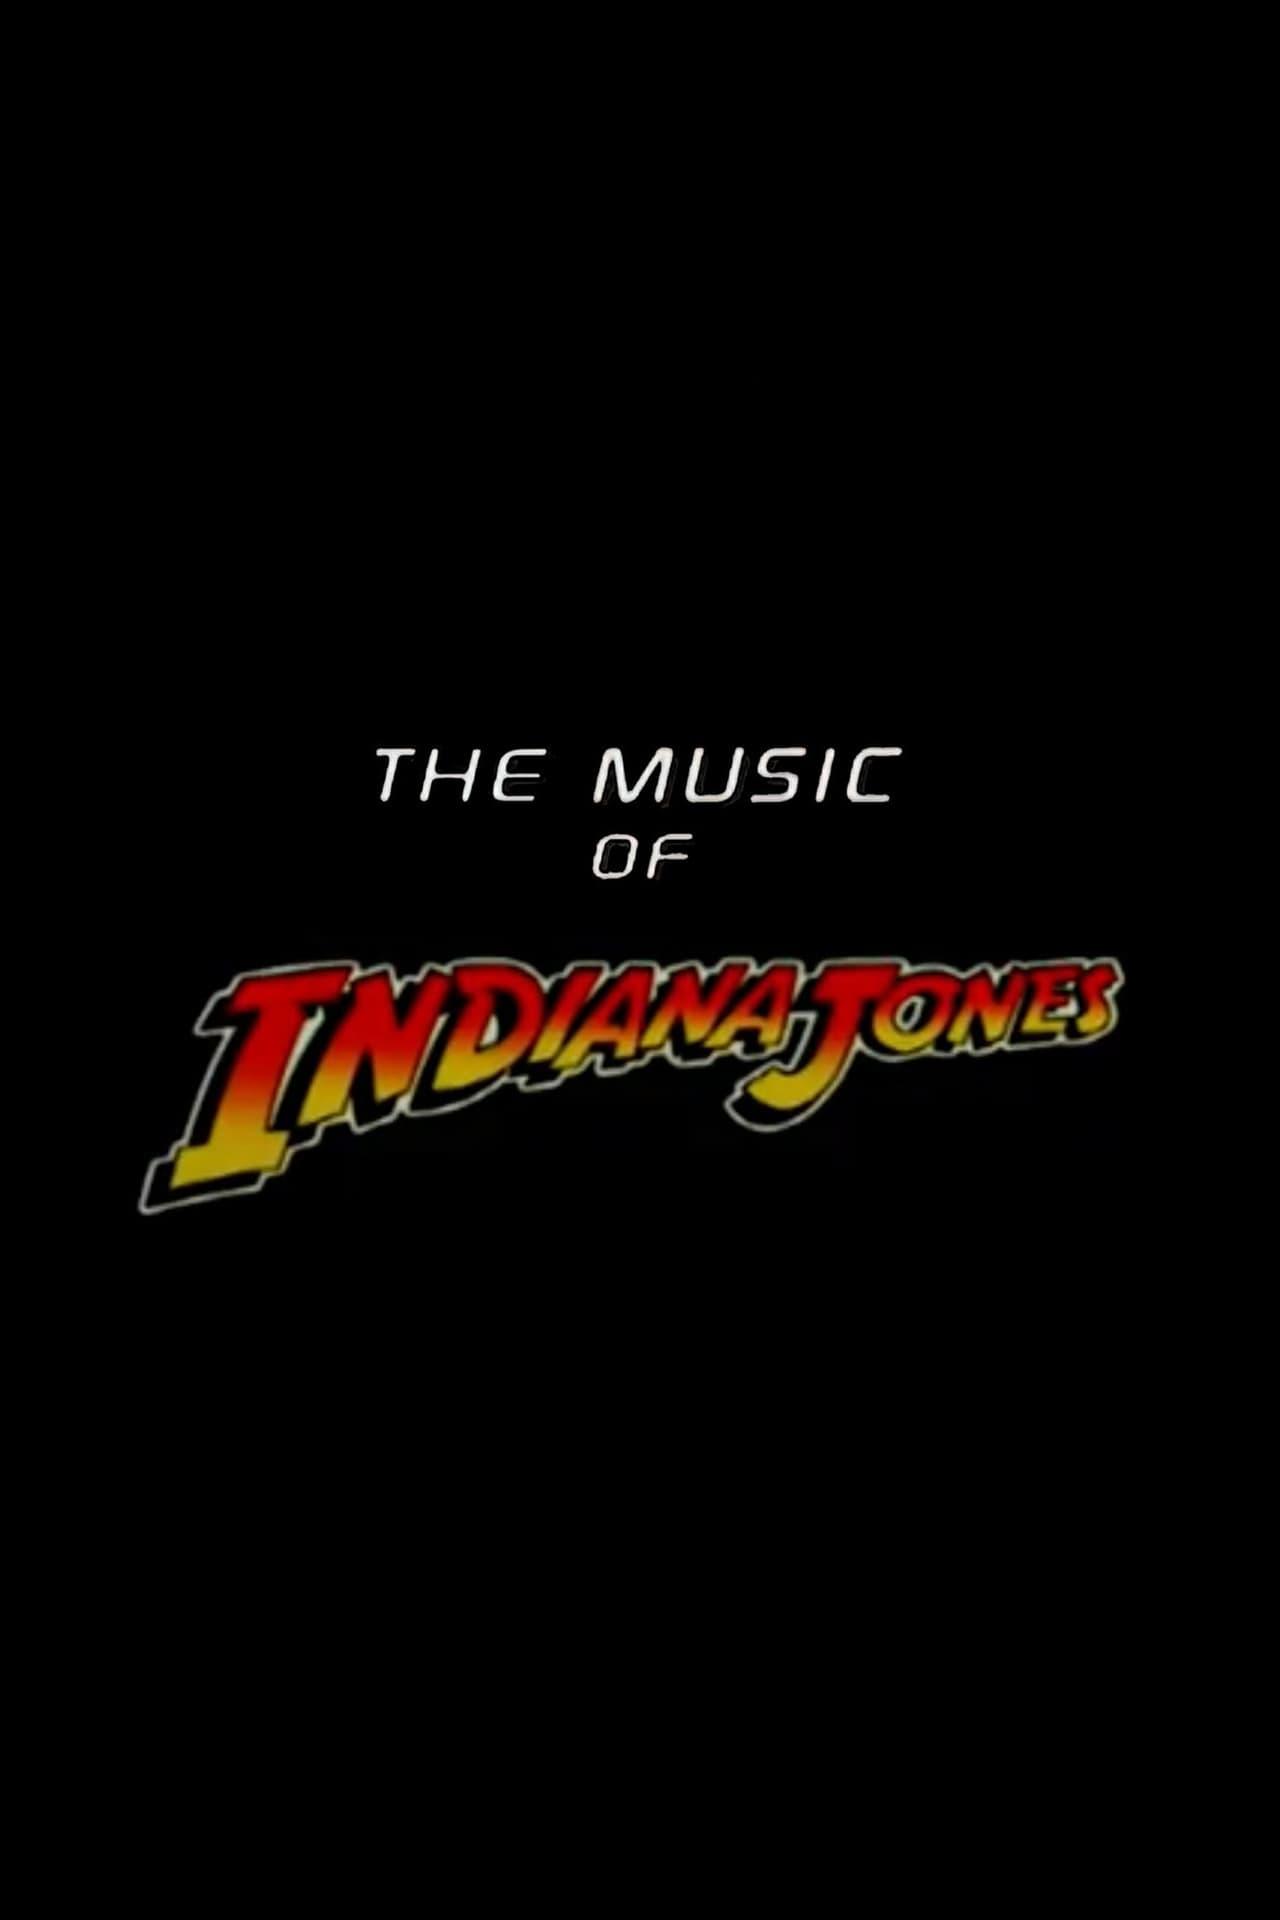 The Music of 'Indiana Jones'